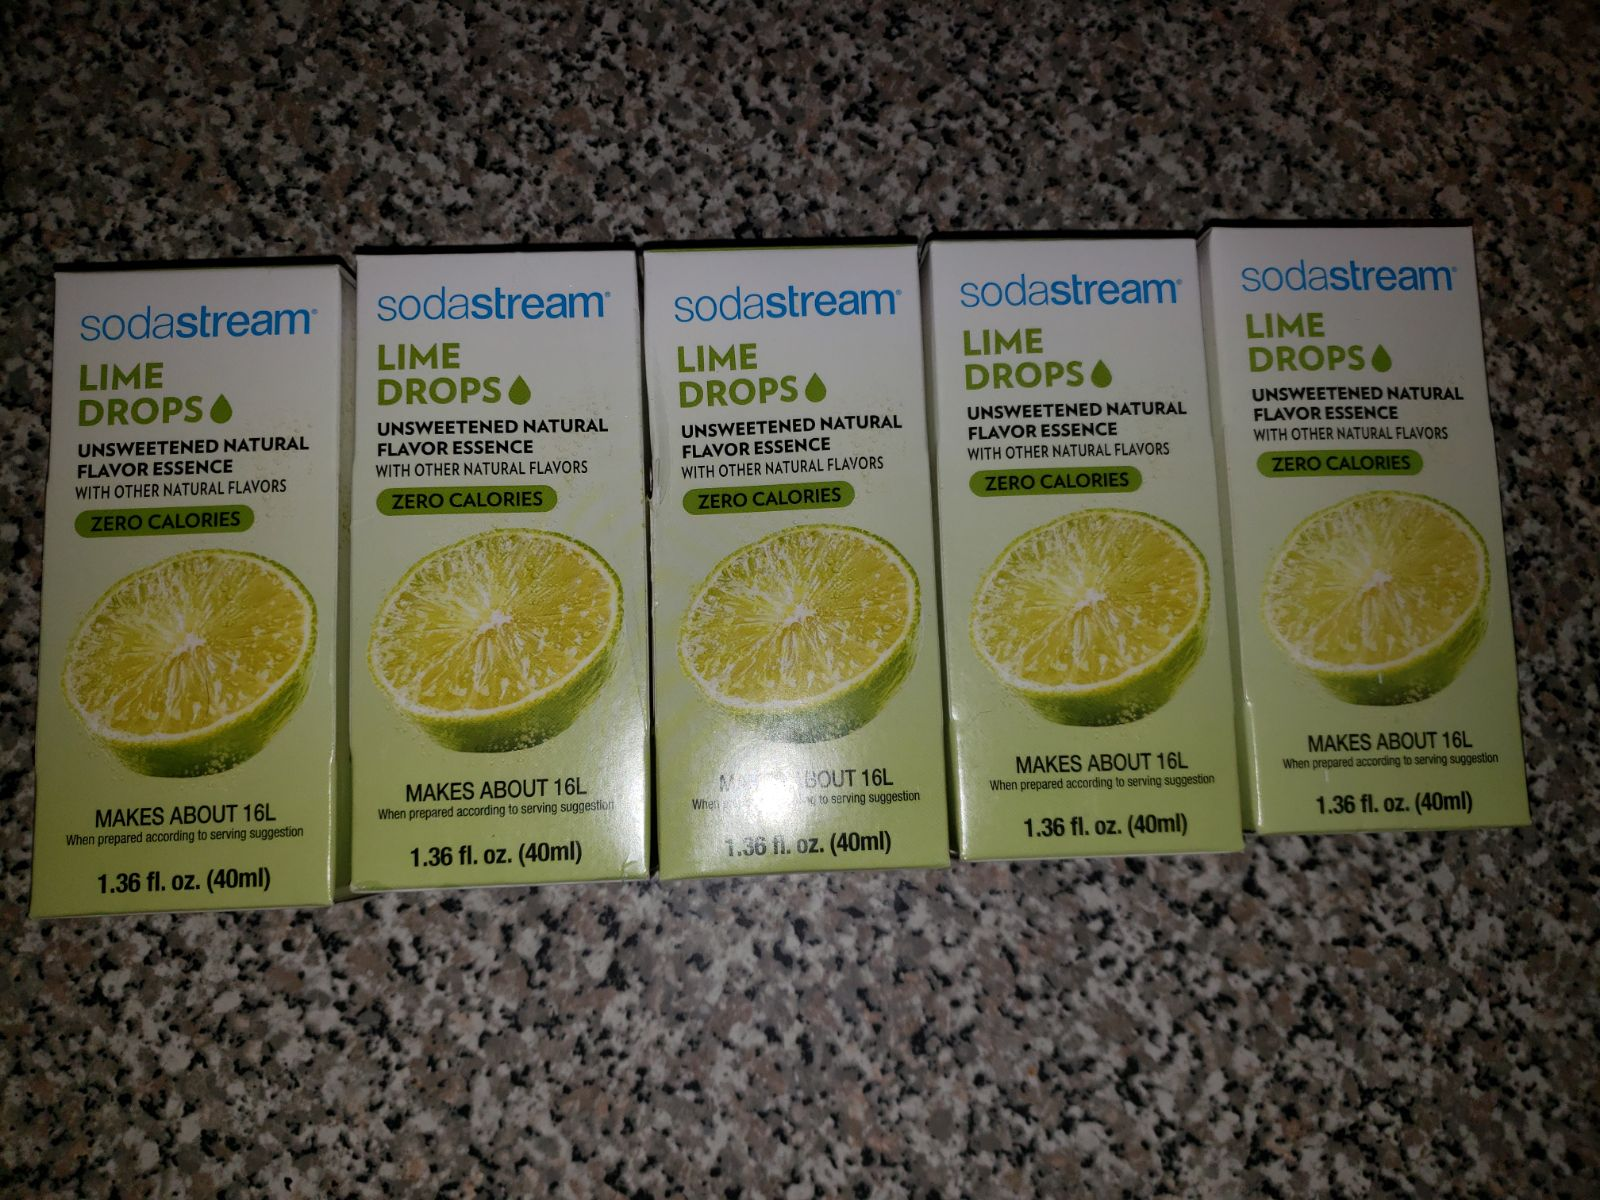 Sodastream Lime Drops Zero Calories (5)